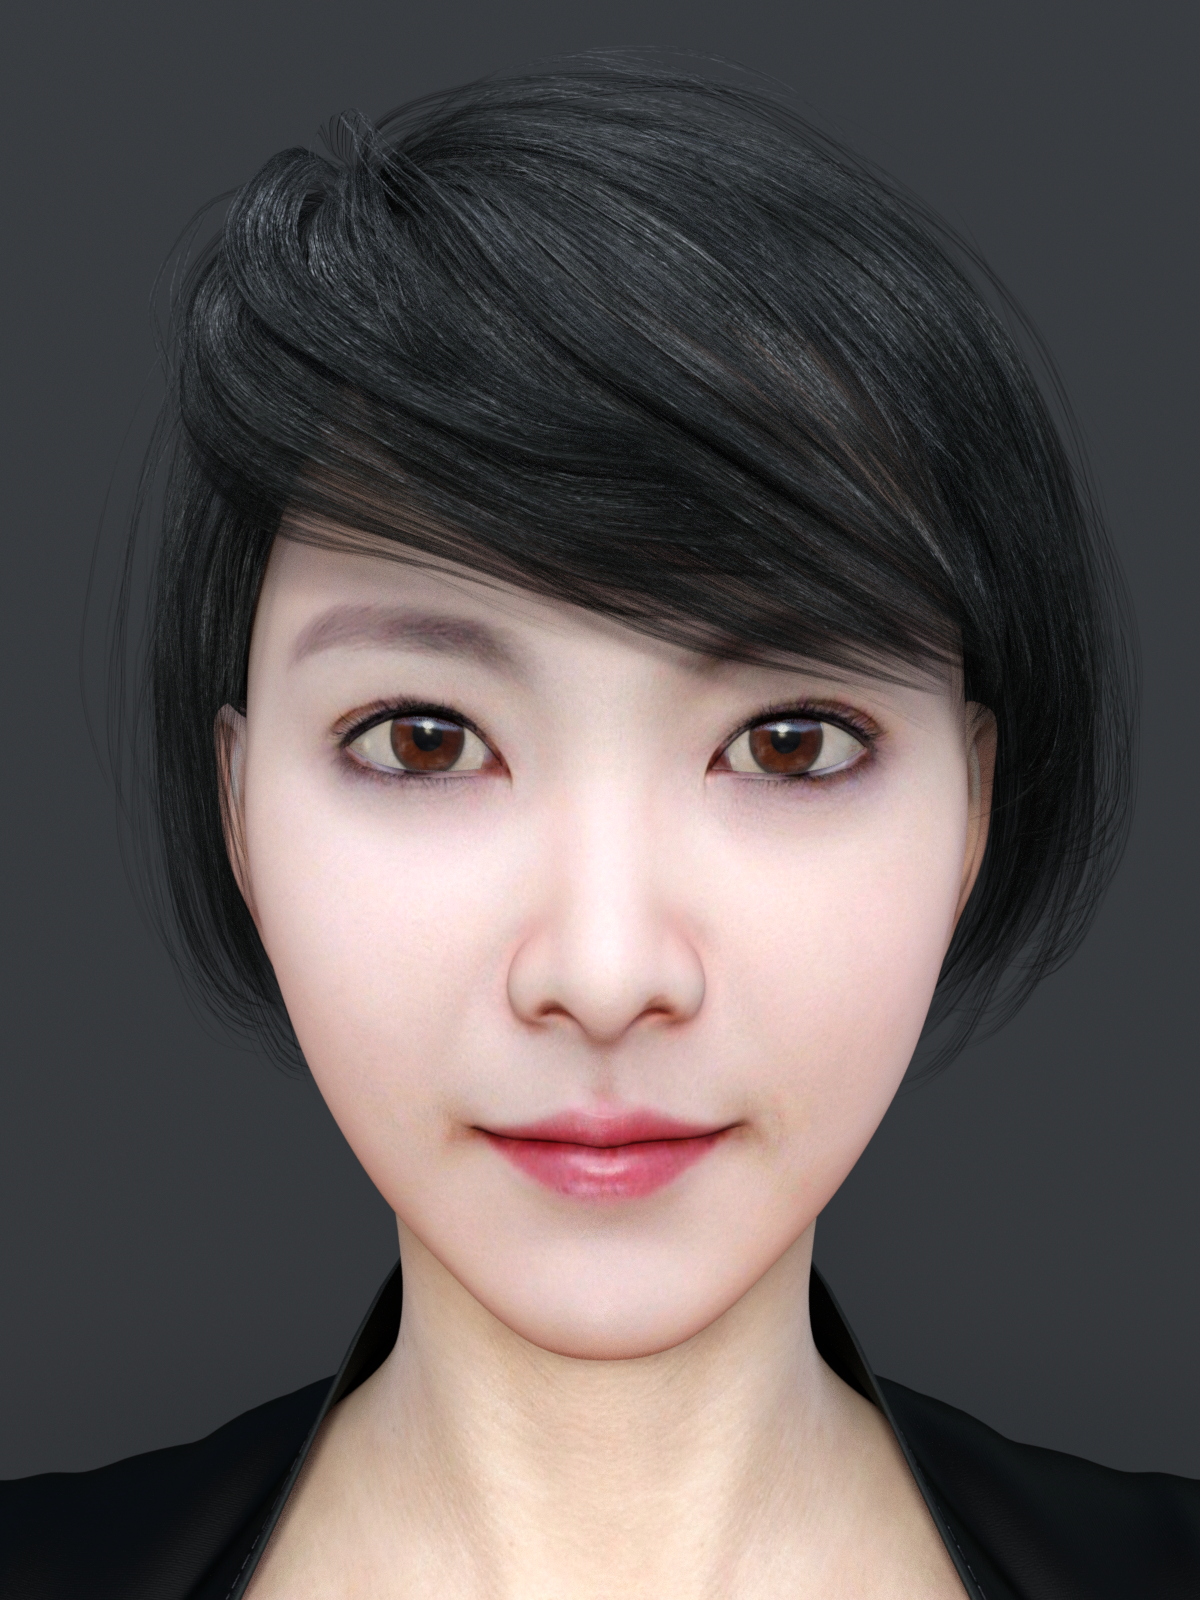 Short Hair Asian Beauty D Model In Woman DExport - Short hair on asian